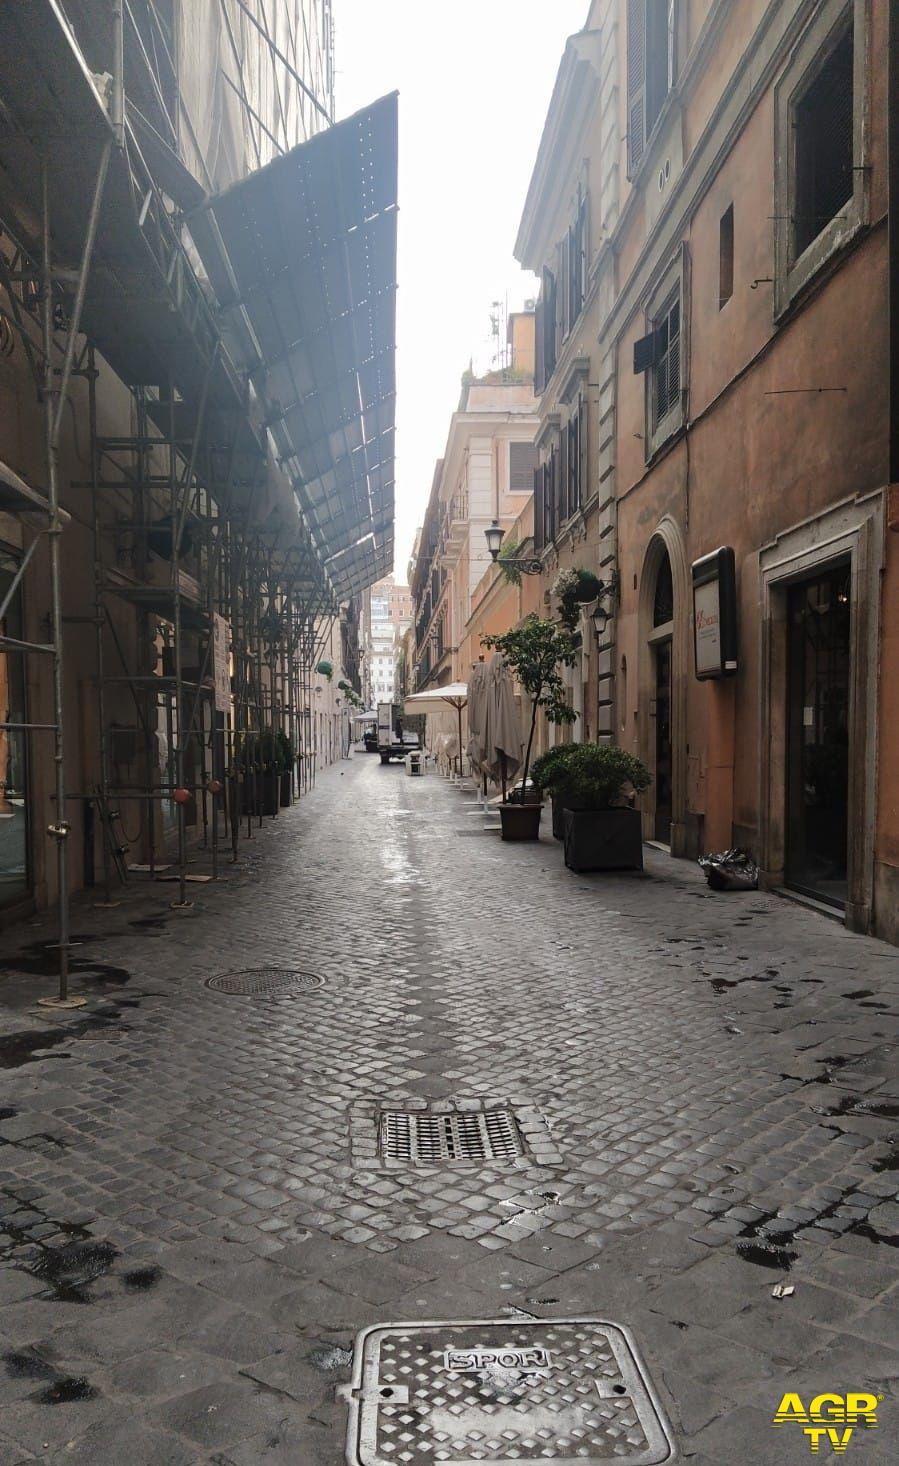 Via del Corso